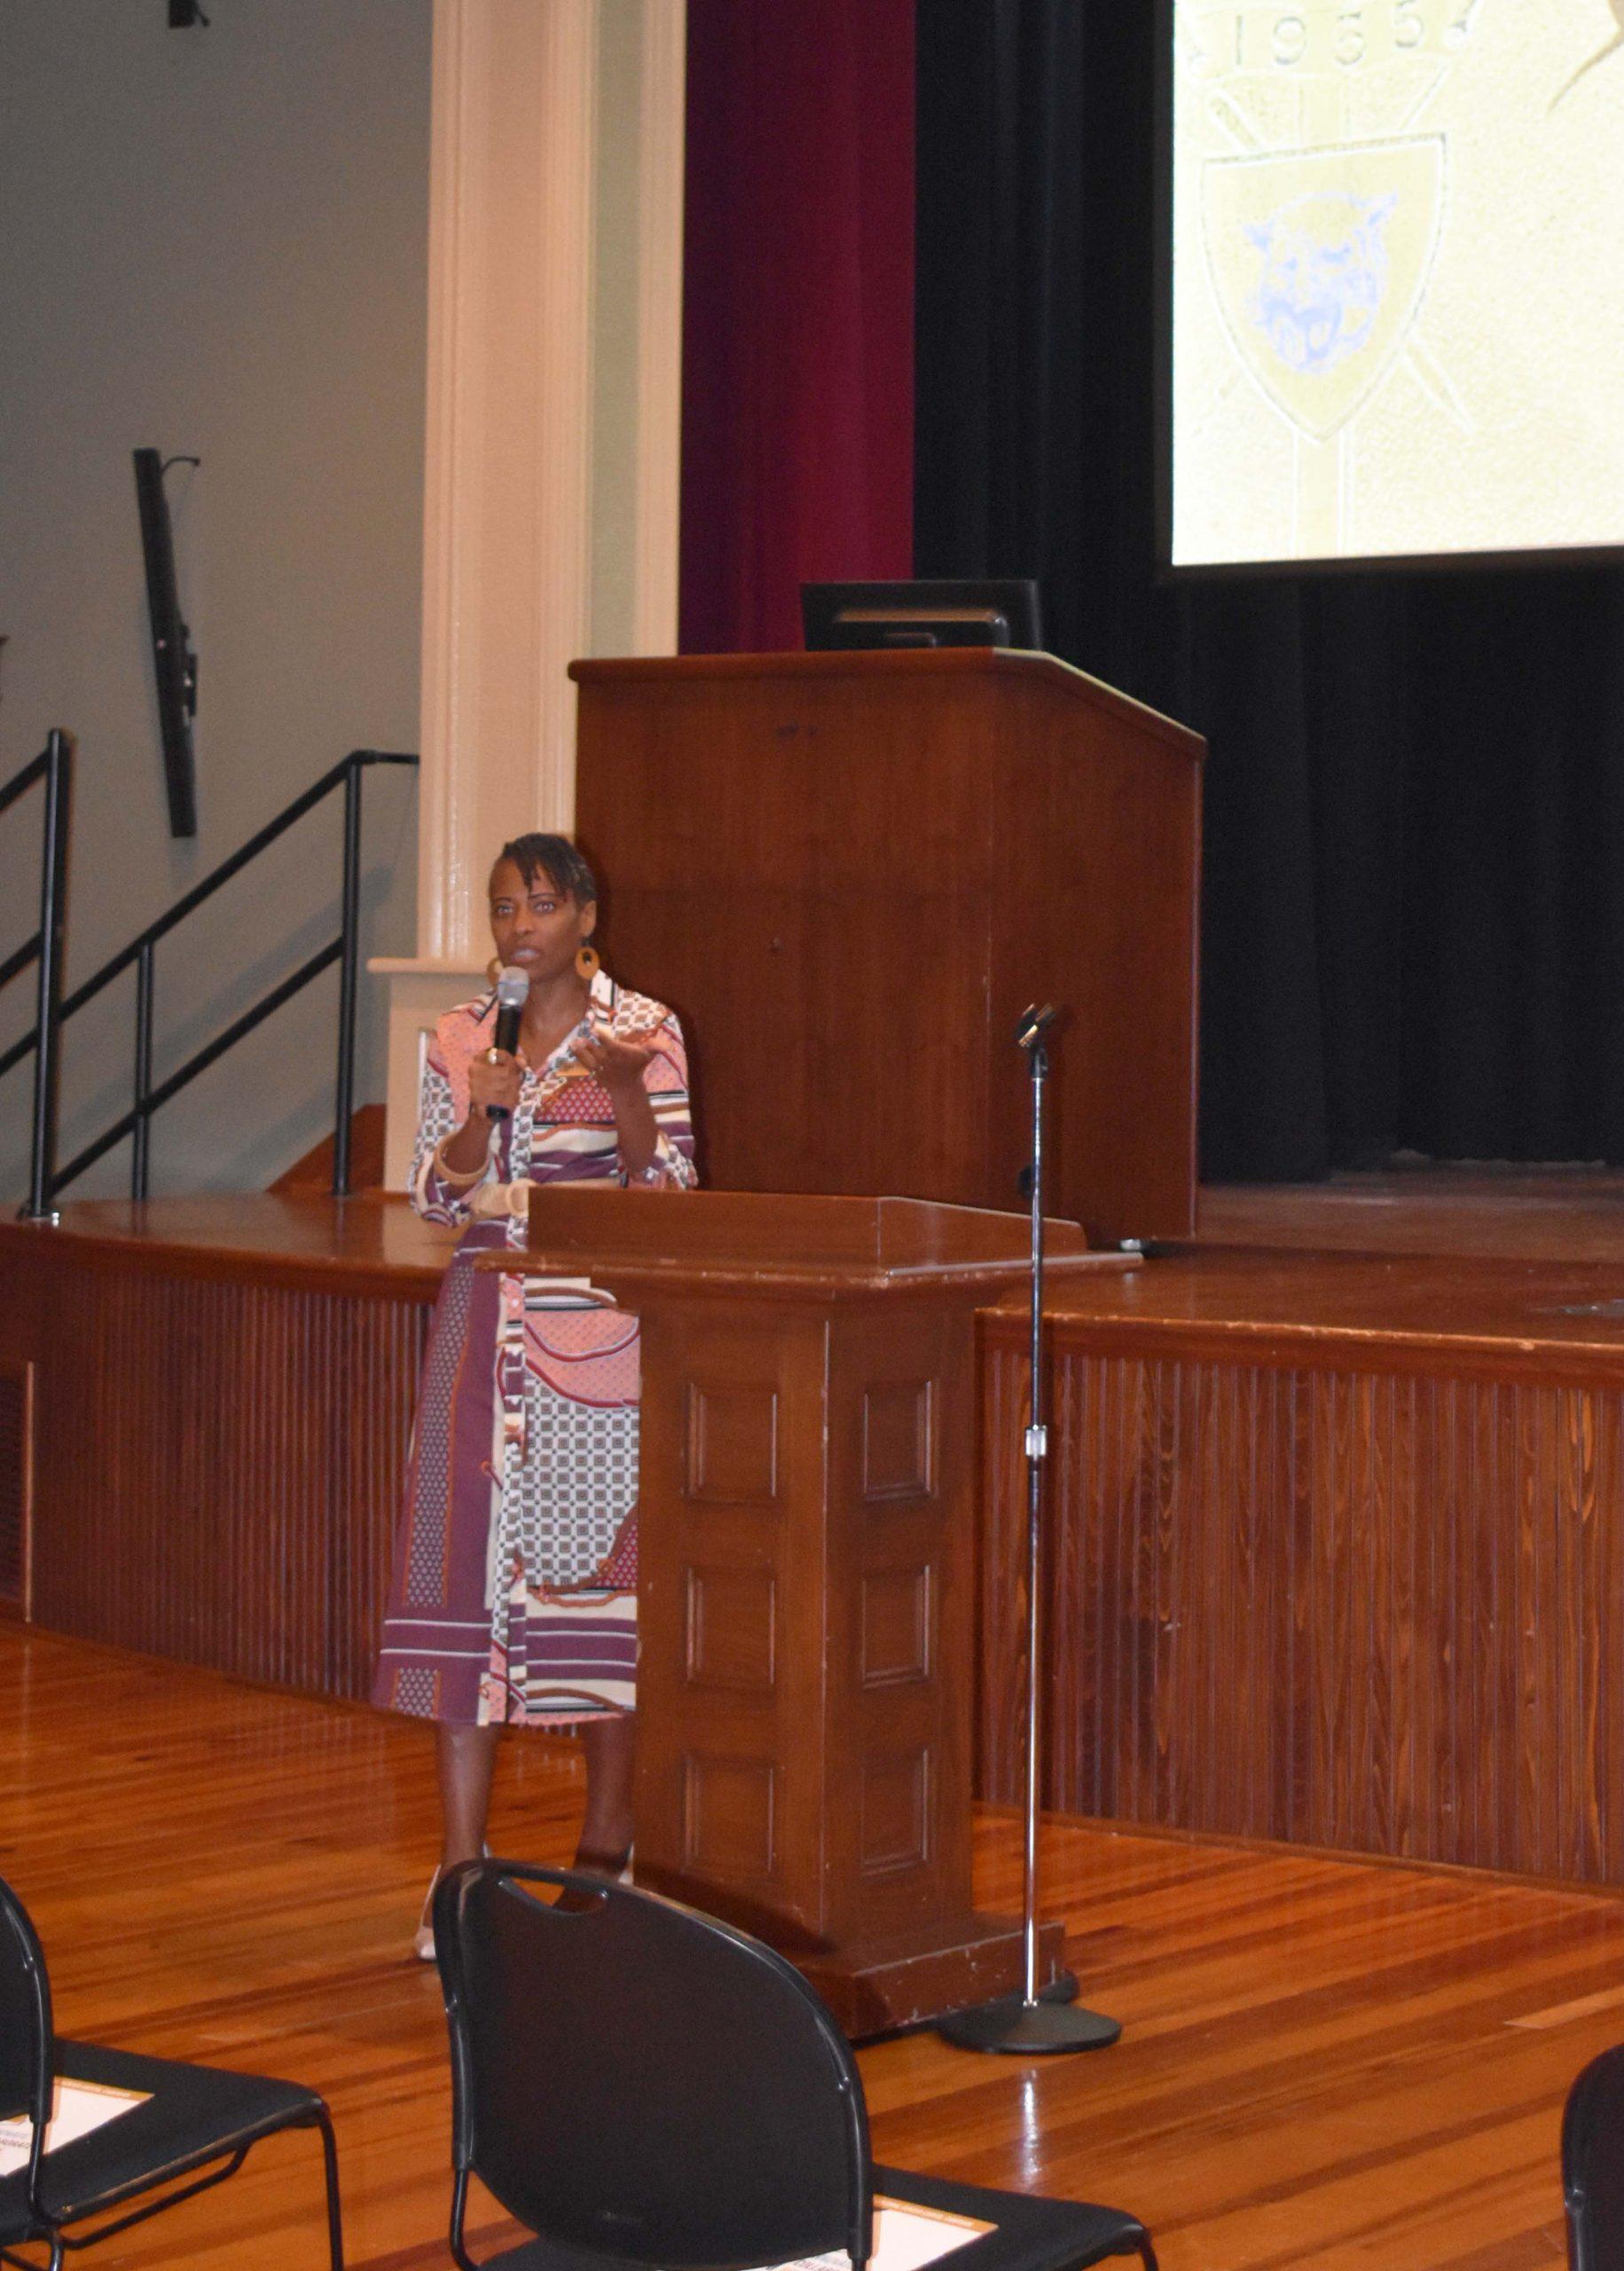 Quantia Fletcher, Mosaic Templars Cultural Center Executive Director, welcomes attendees